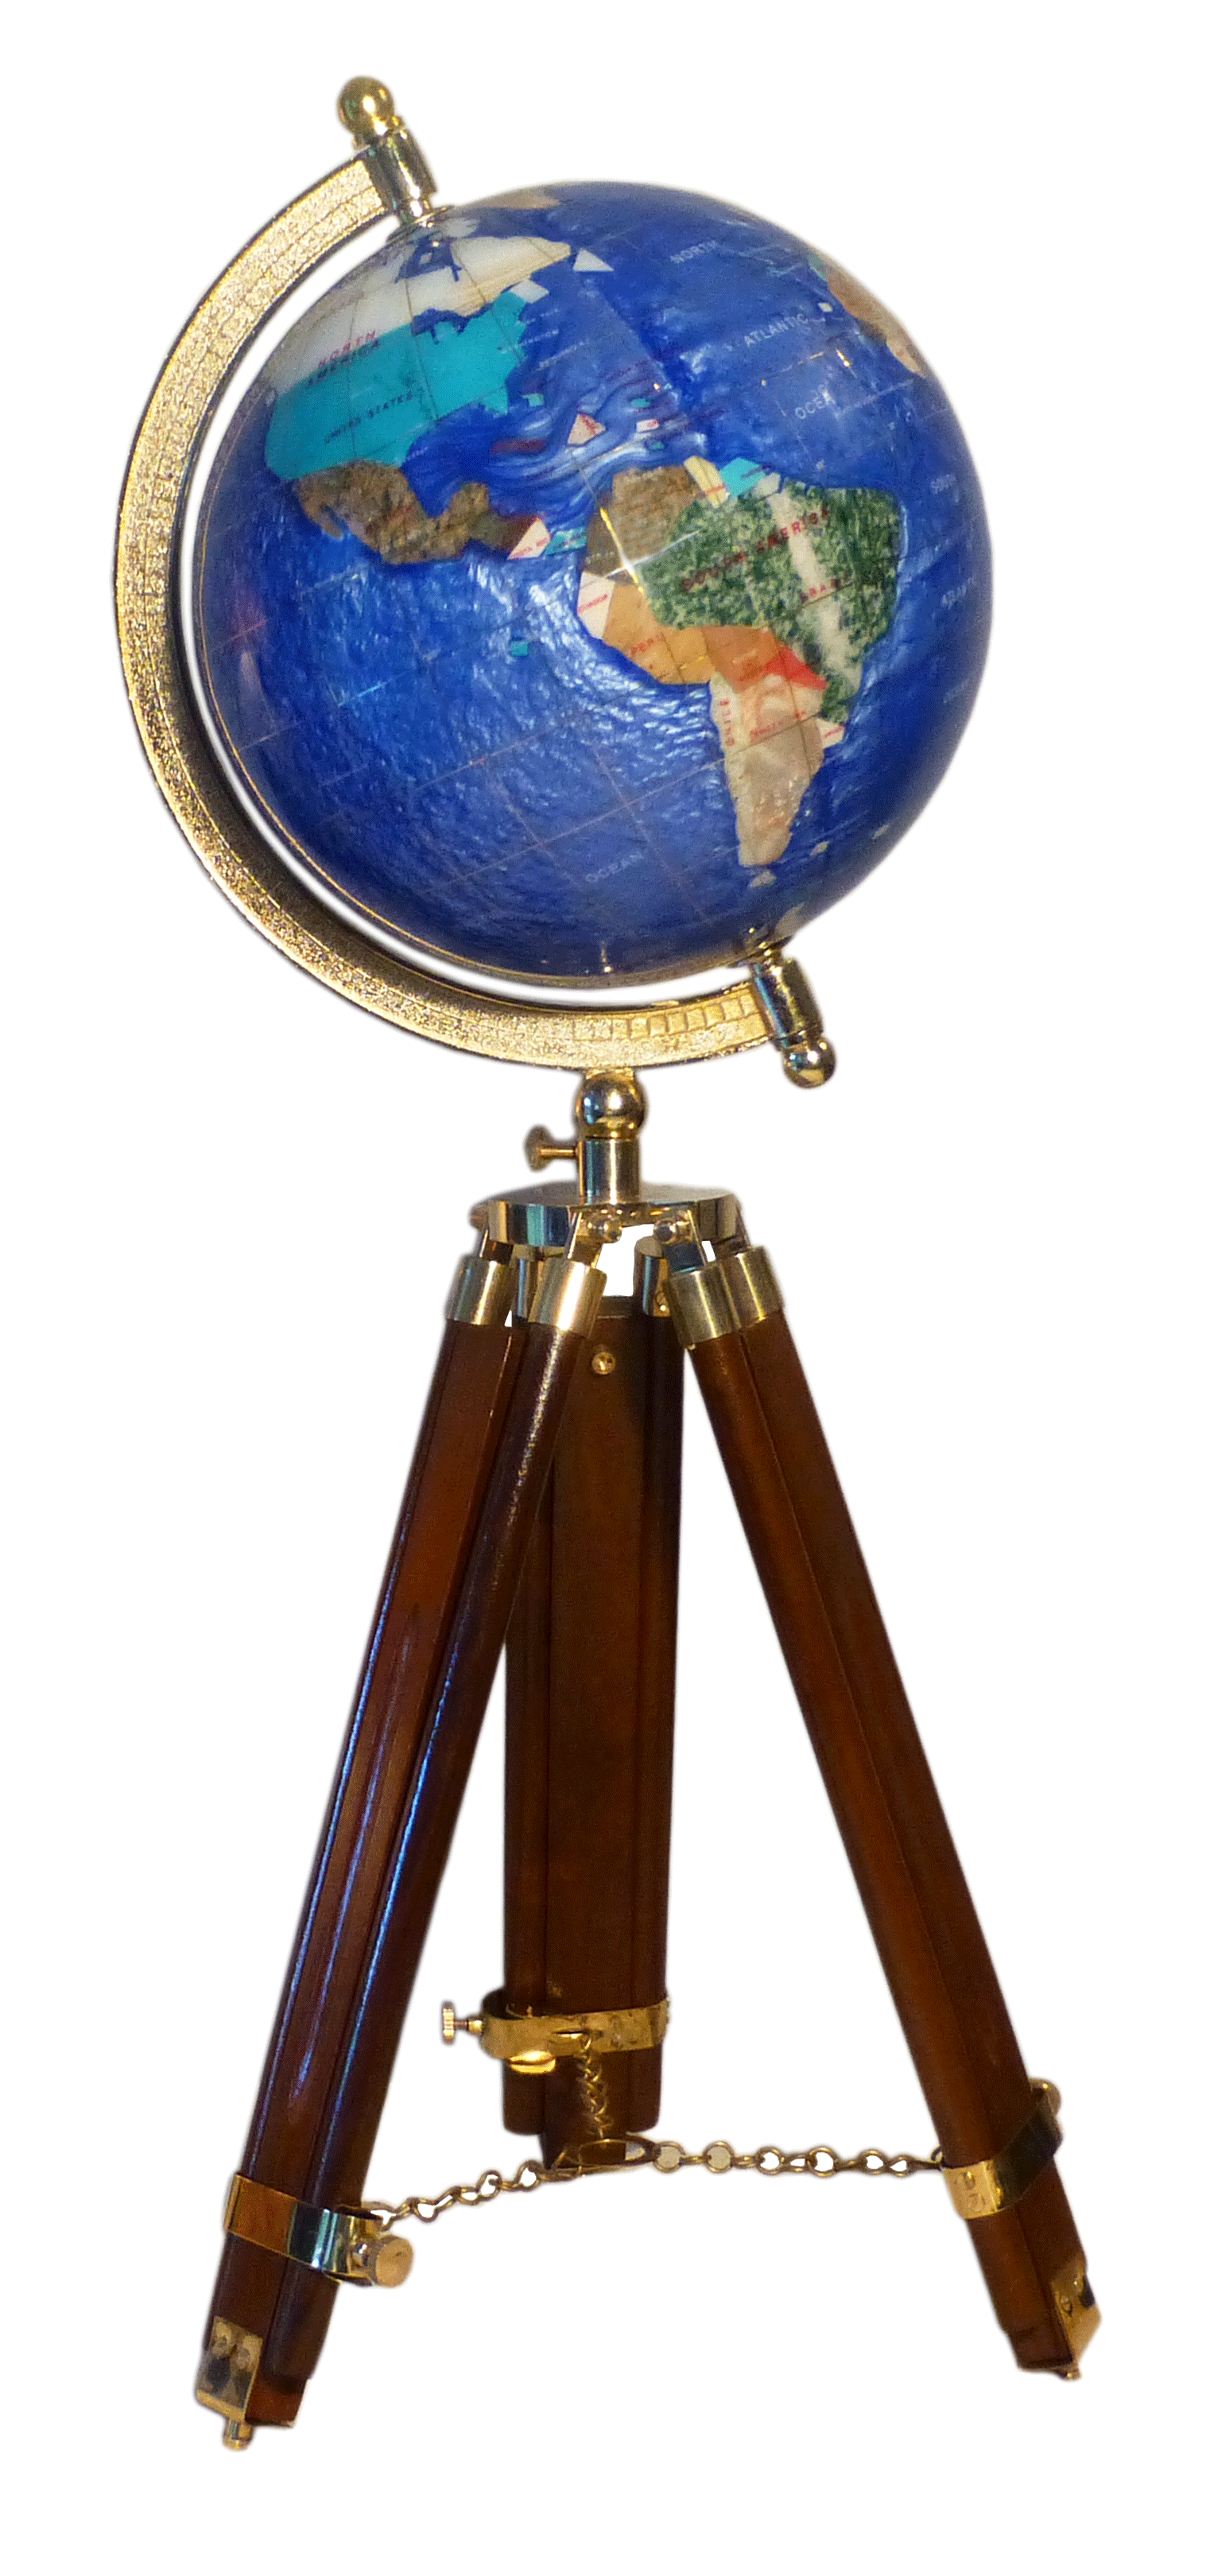 globe terrestre de bureau 22 cm bleu cambridge tr pied bois gemmoglobe 1pb 22 b bleu c. Black Bedroom Furniture Sets. Home Design Ideas